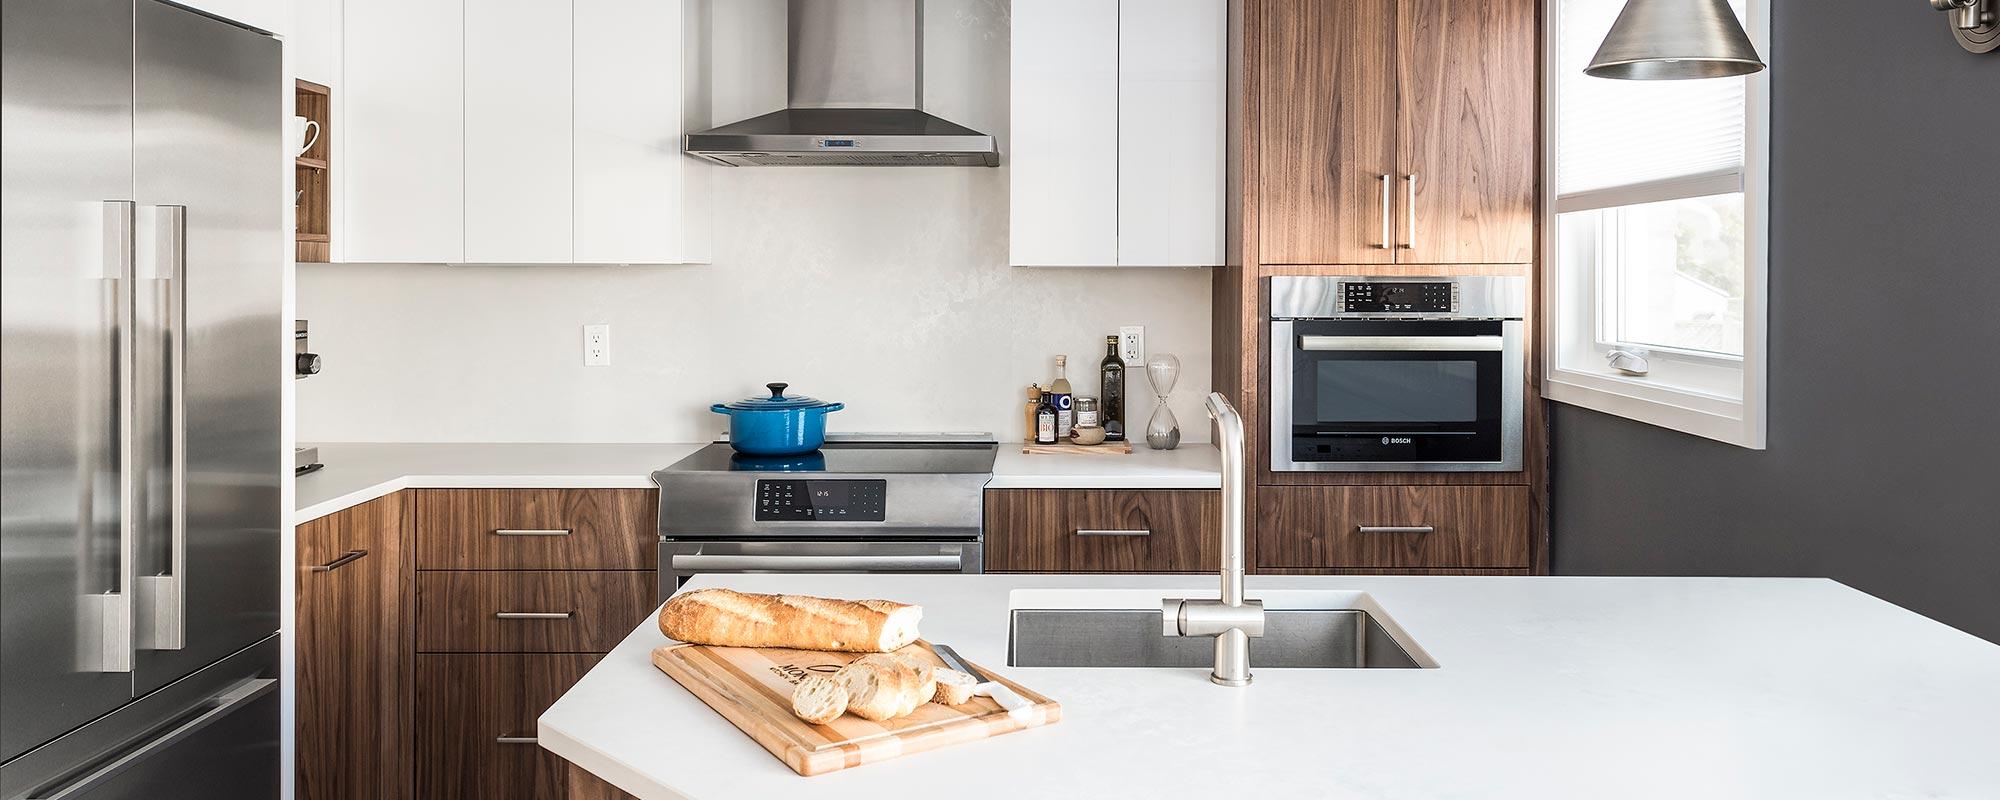 Lilley Avenue Kitchen Renovation